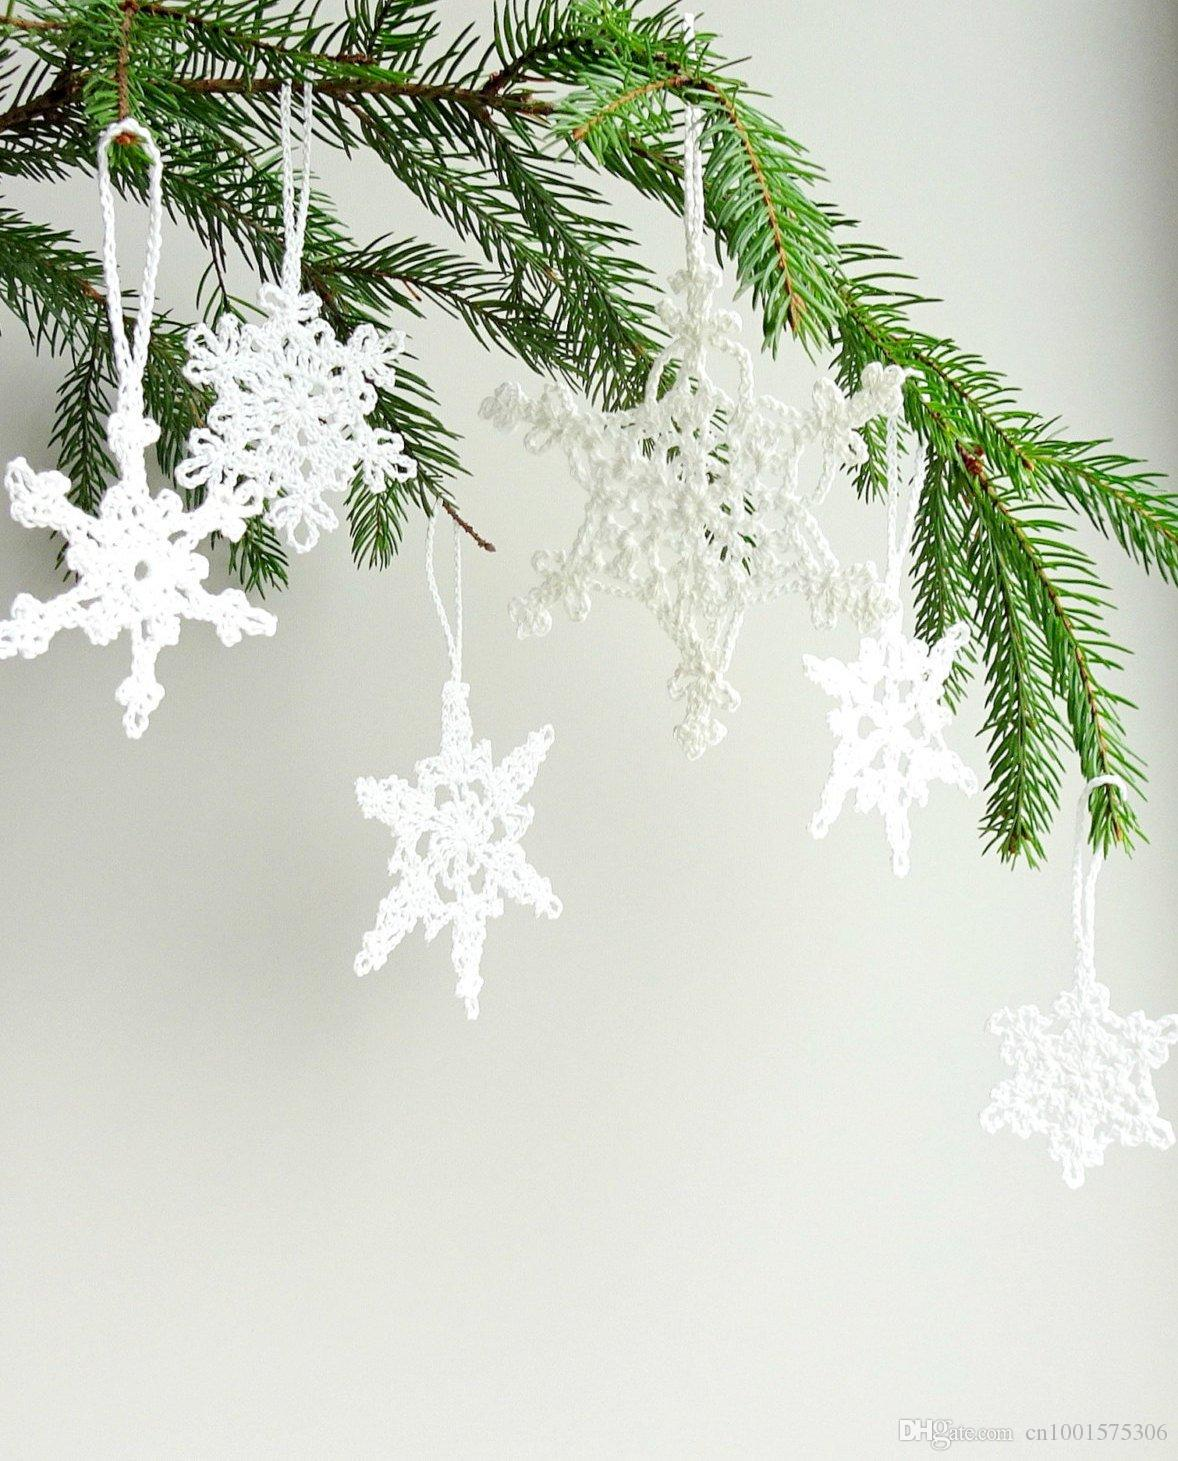 Grosshandel Christbaumschmuck Weisse Schneeflocken Dekorationen Hakeln